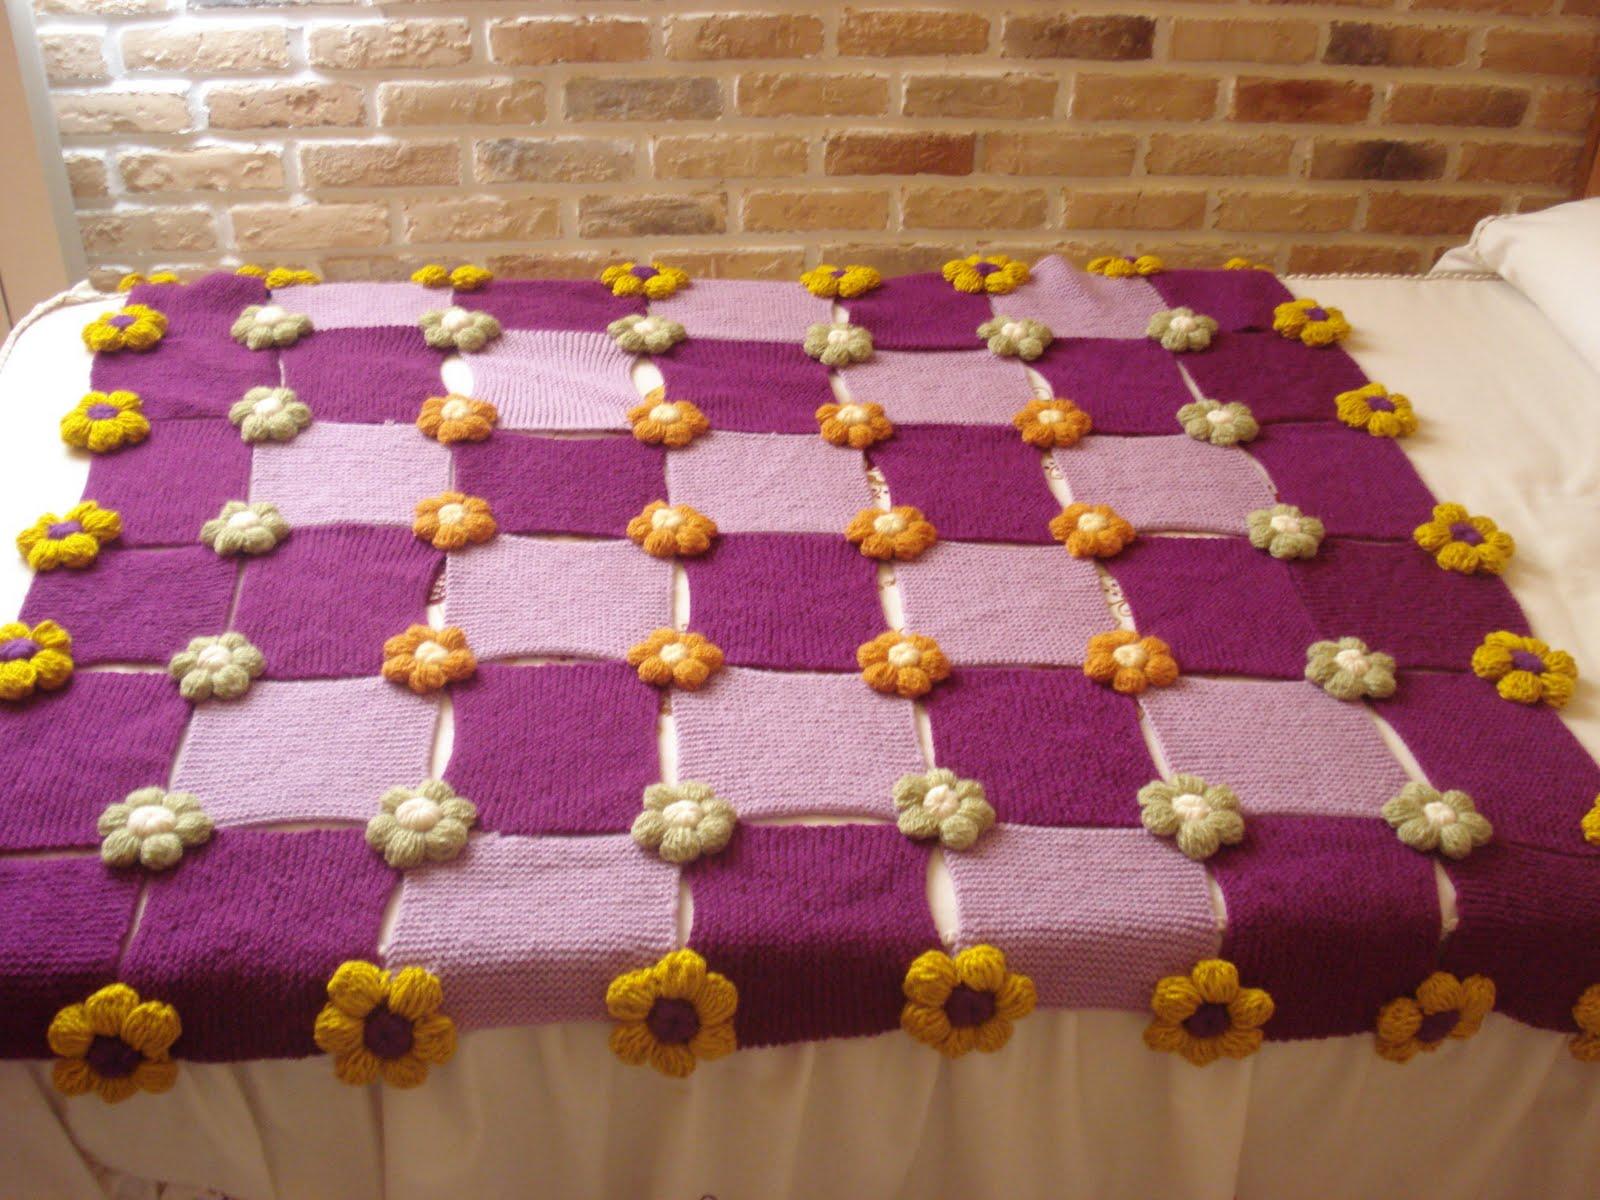 Manta lila en dos agujas y flores de bot n en ganchillo for Mantas de lana hechas a mano